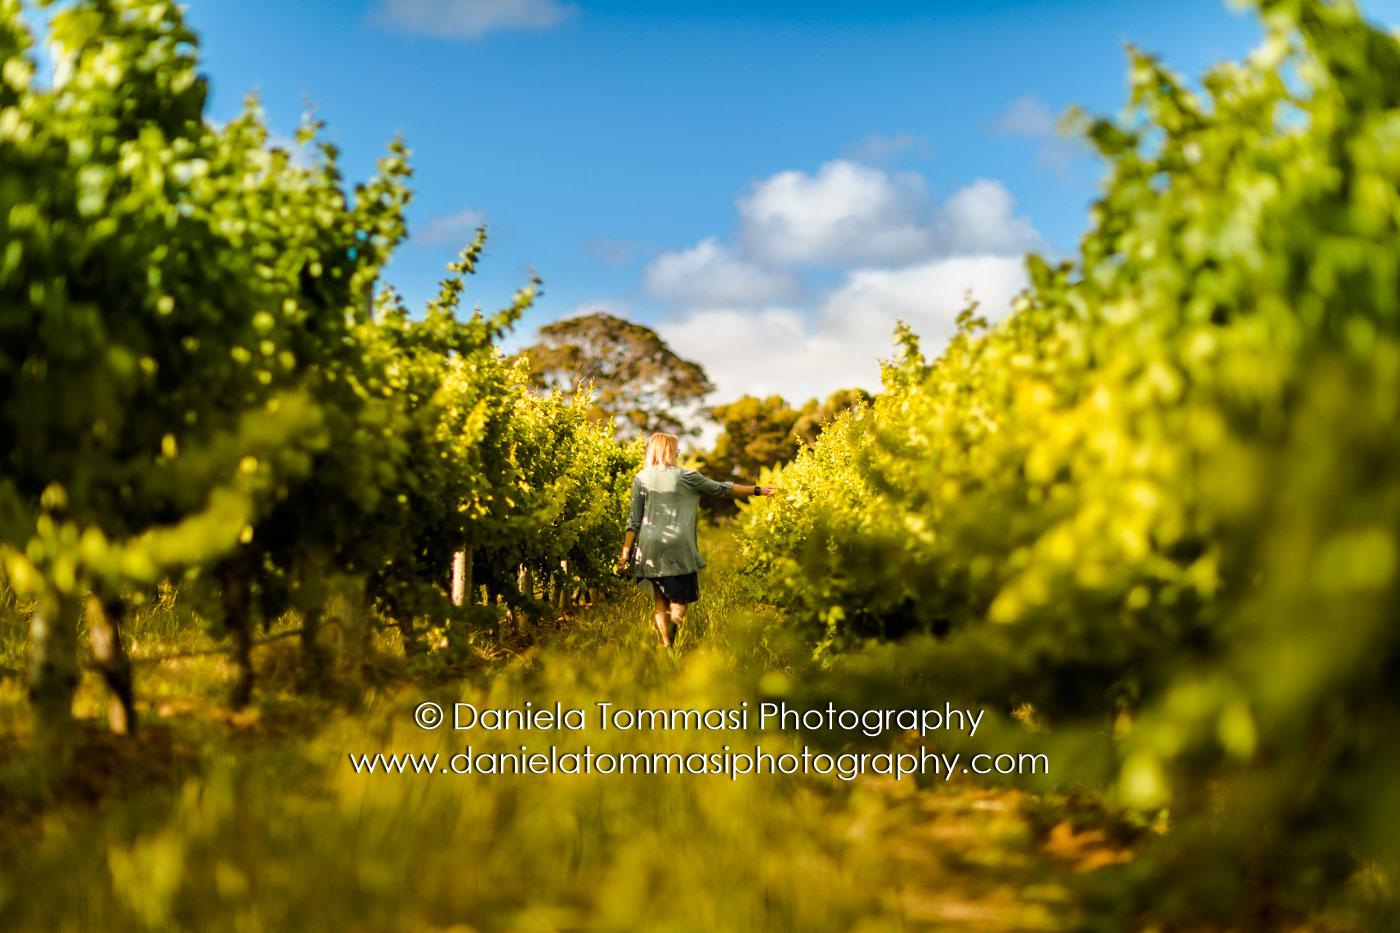 Winery-Daniela Tommasi Photography-5